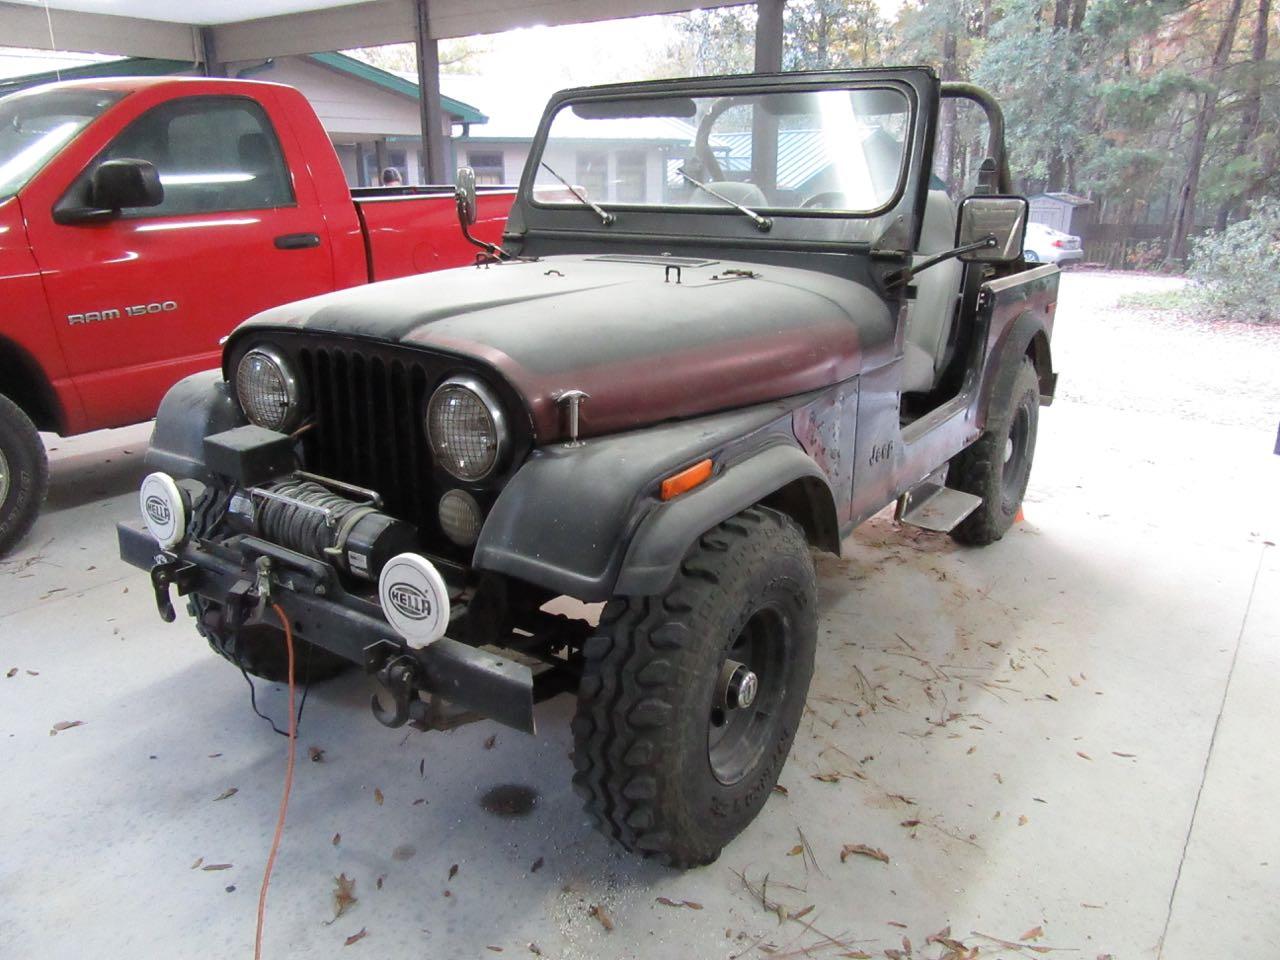 Florida Coal Cracker Chronicles: Josh's Antique 1980 Jeep ...